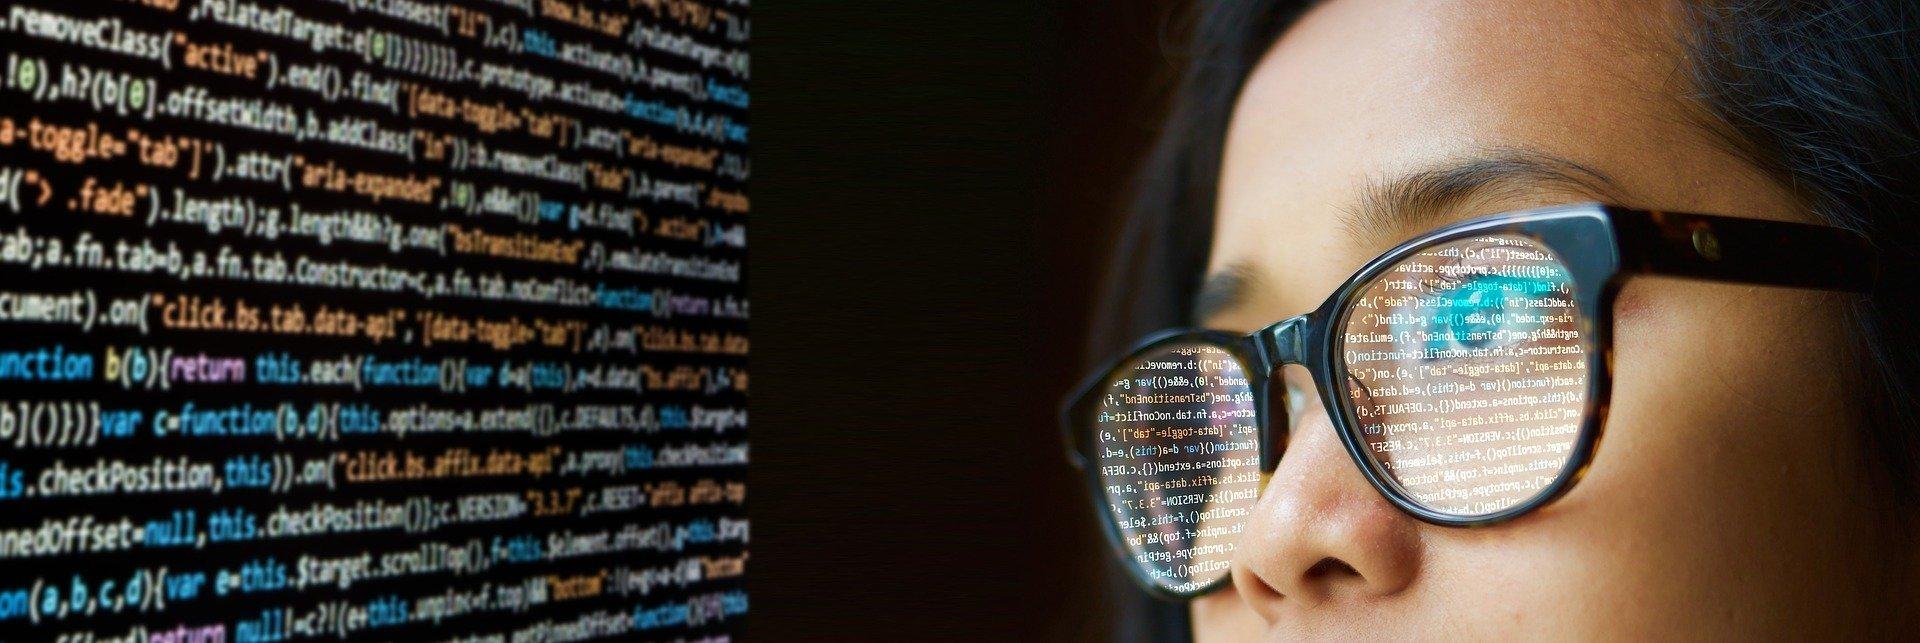 mulheres e tecnologia